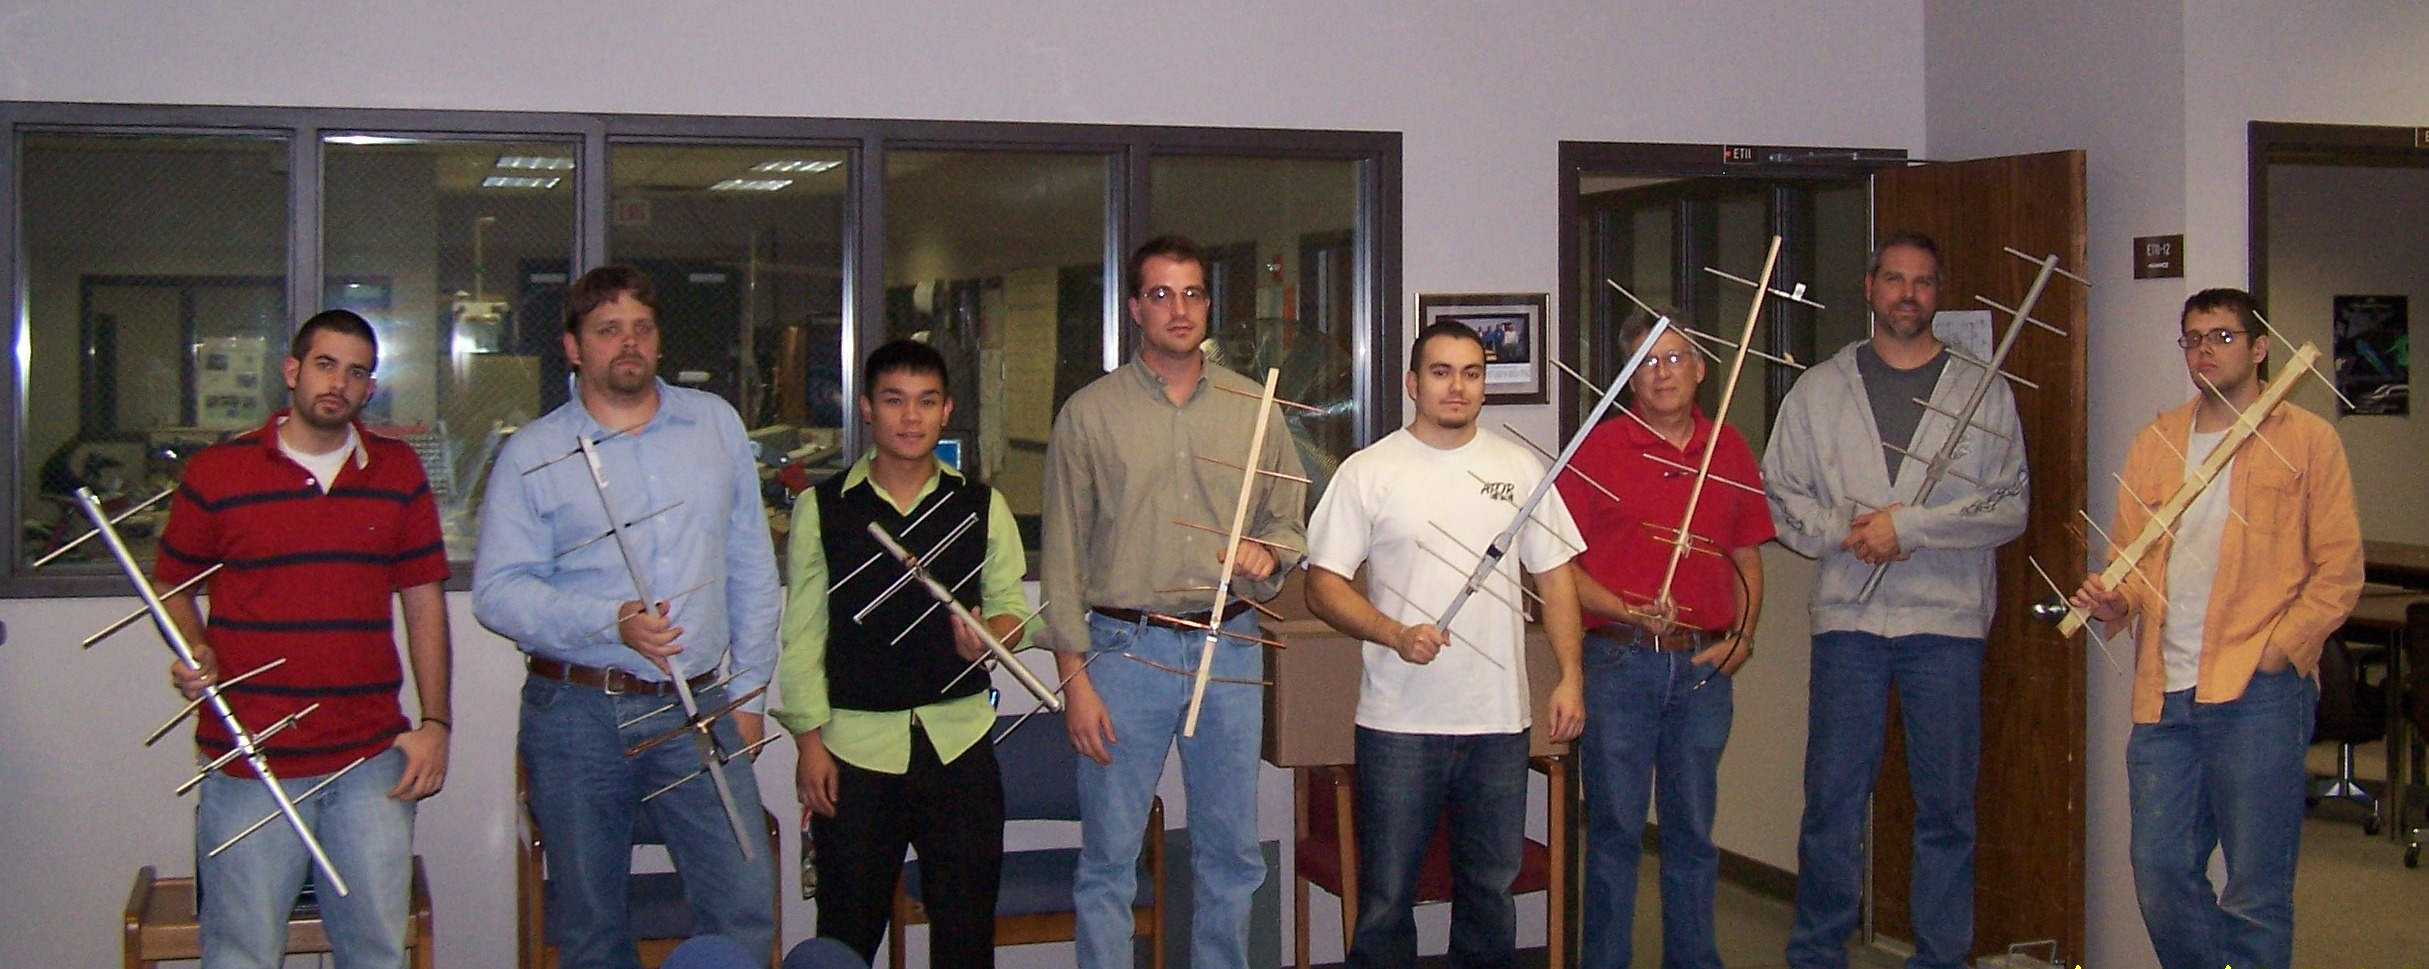 Tulsa Community College 106